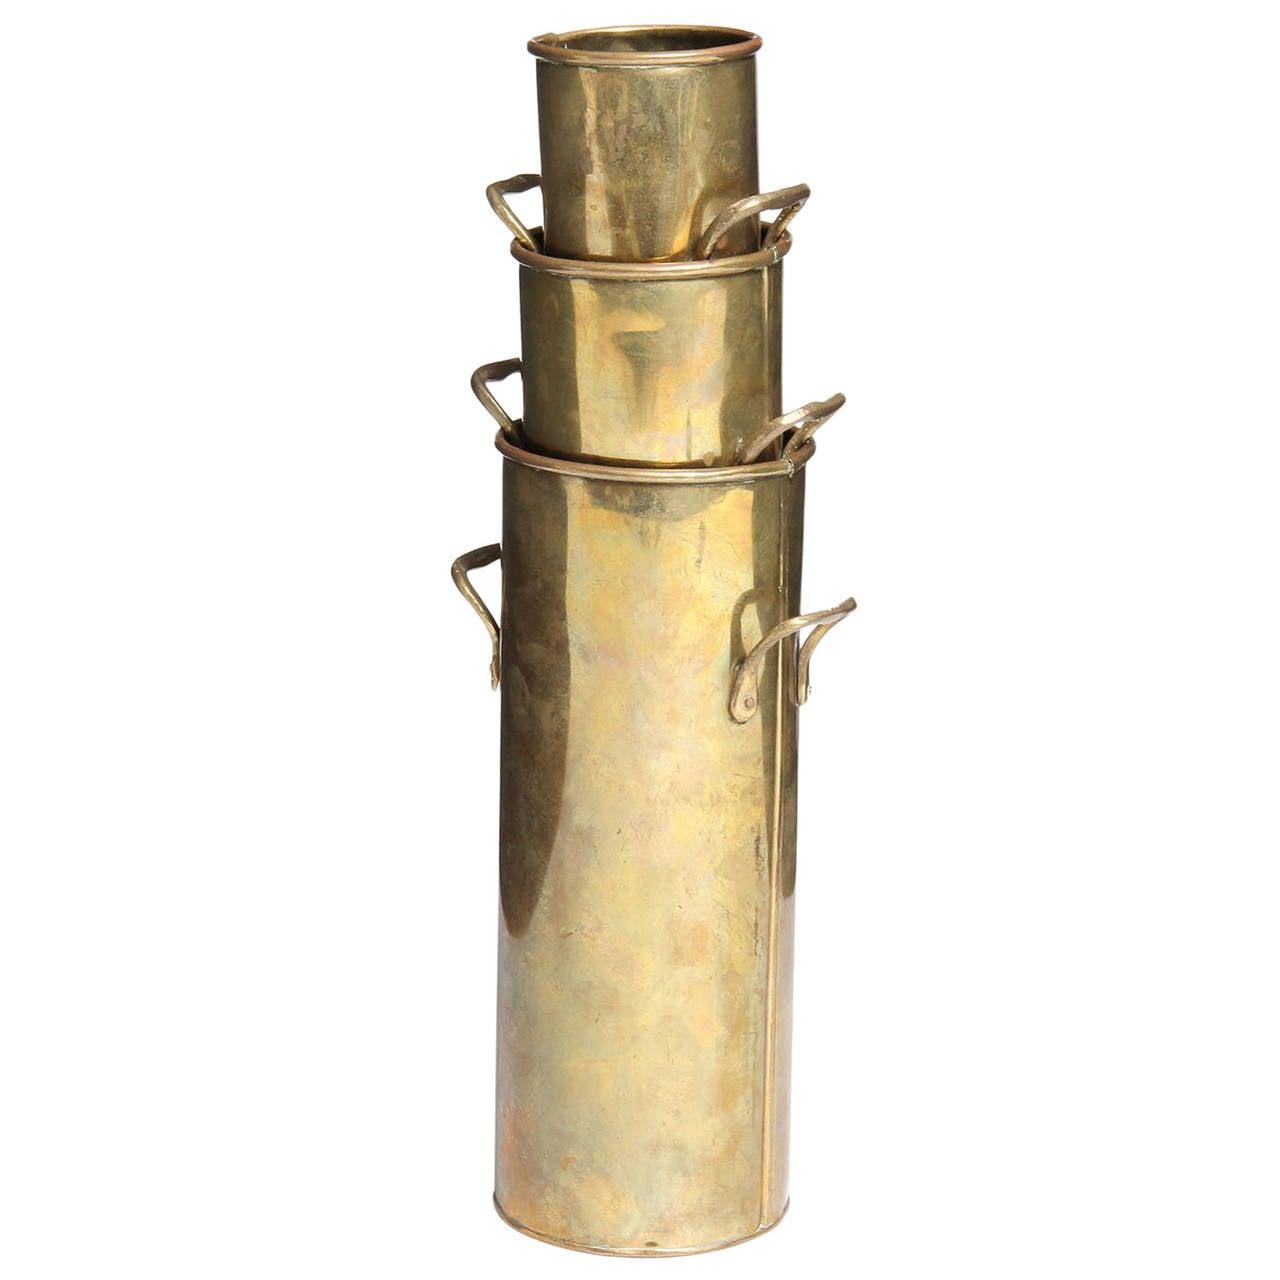 Nesting brass vases, 1960s